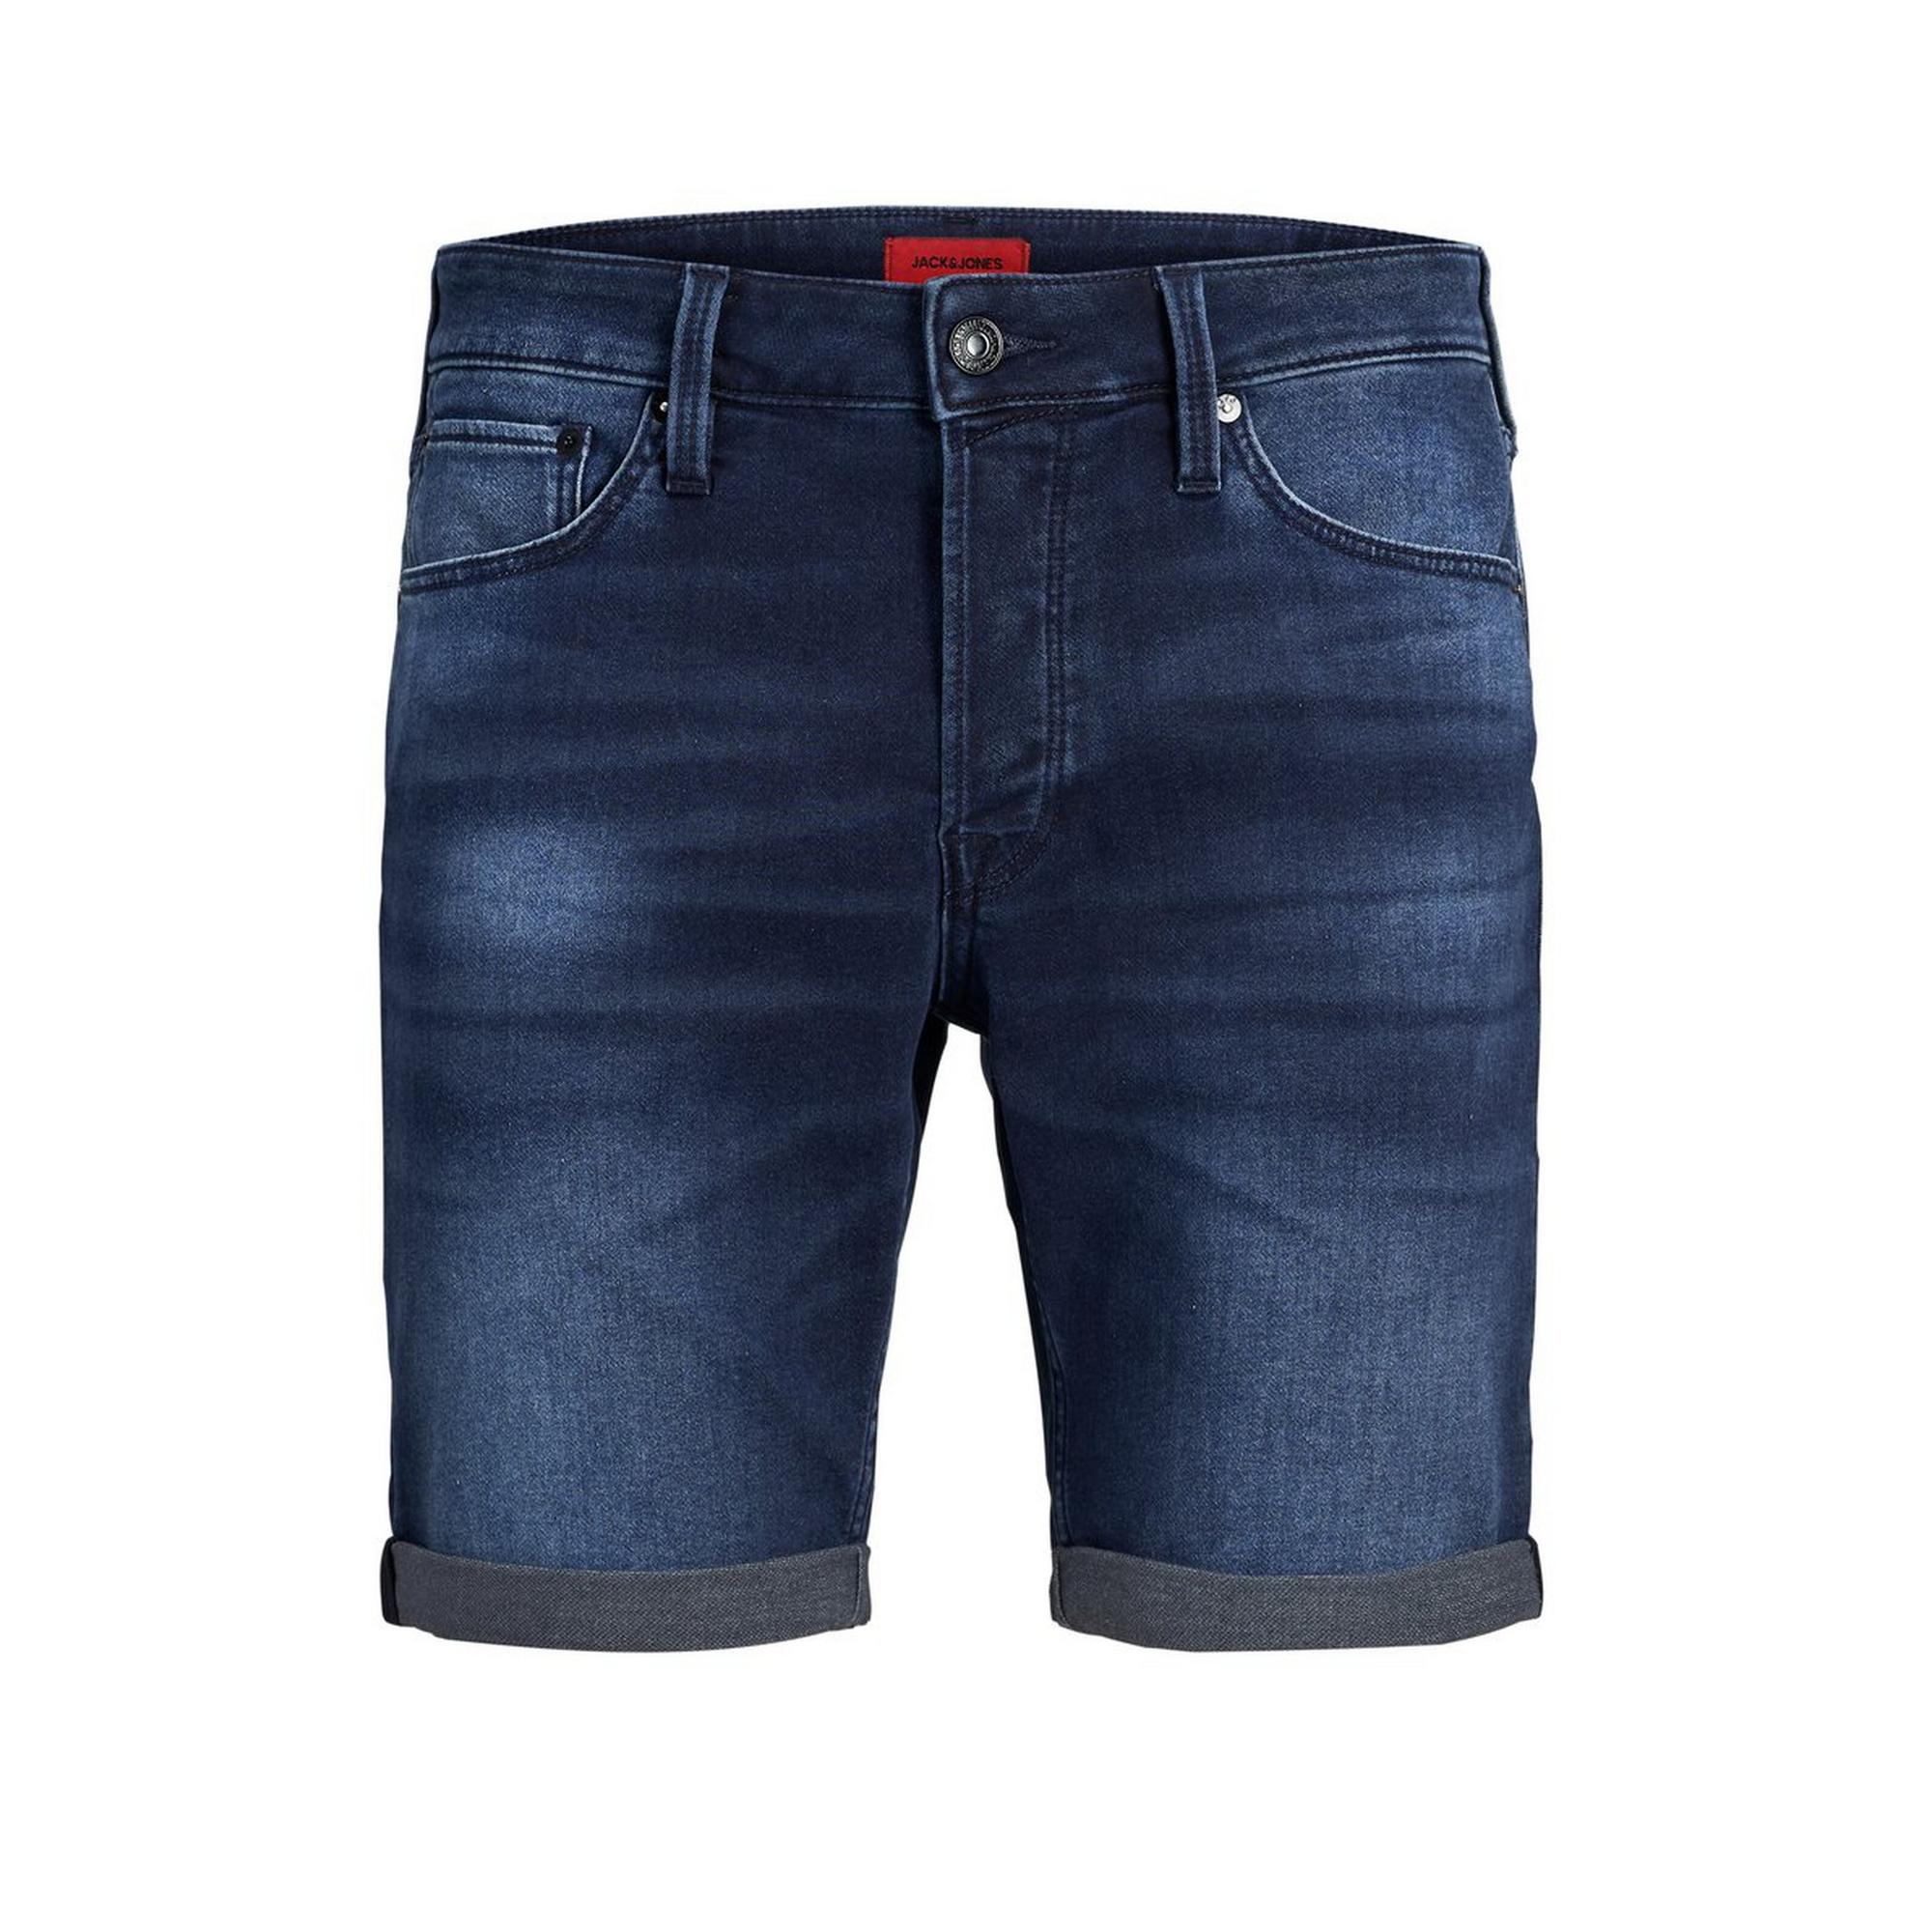 JACK&JONES Hombre Bermuda Shorts Playa Pantalon Corto